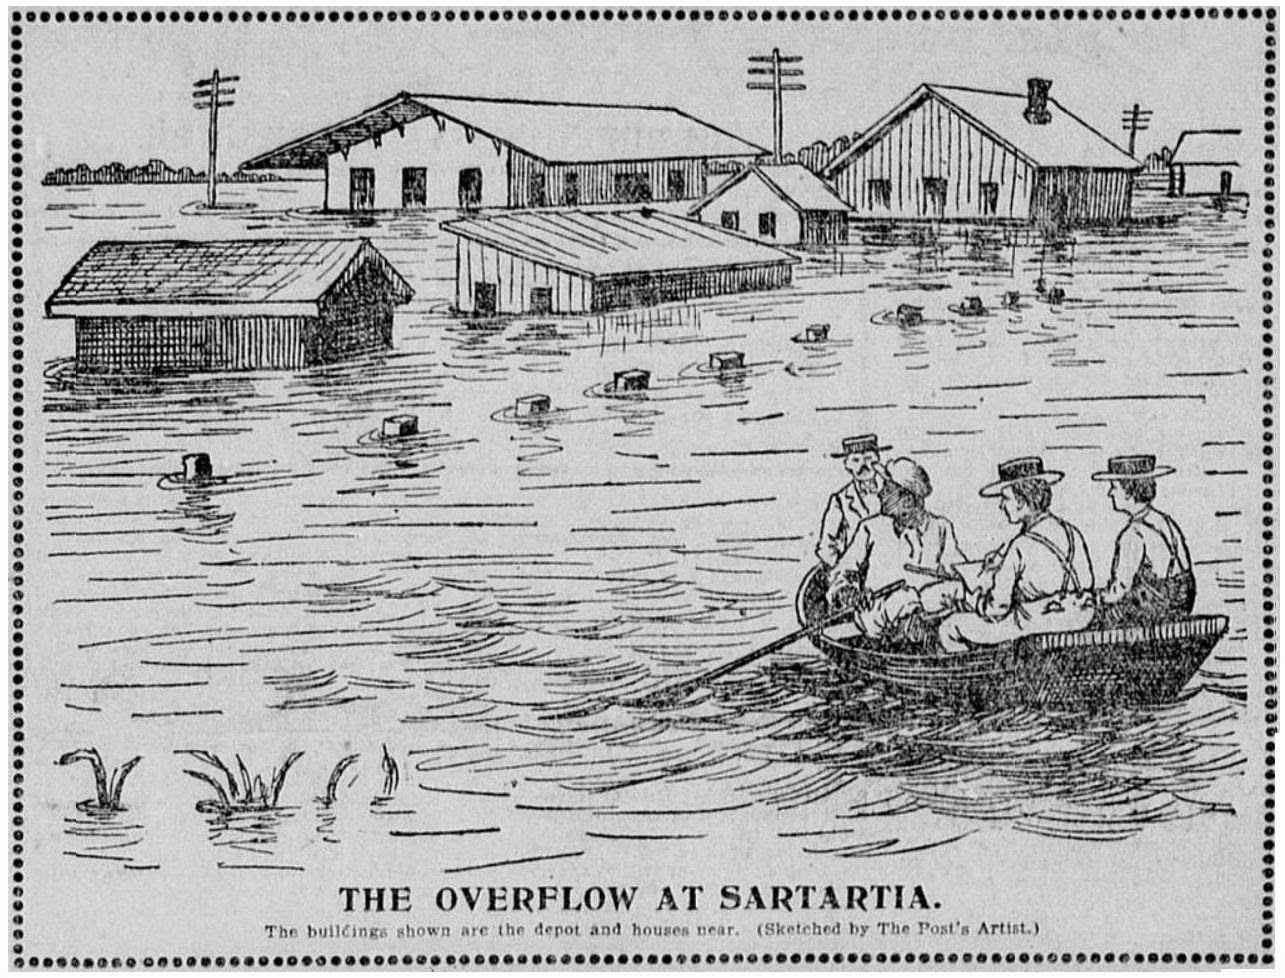 1285x978 The Old Sugar Land Club House 1899 Flood